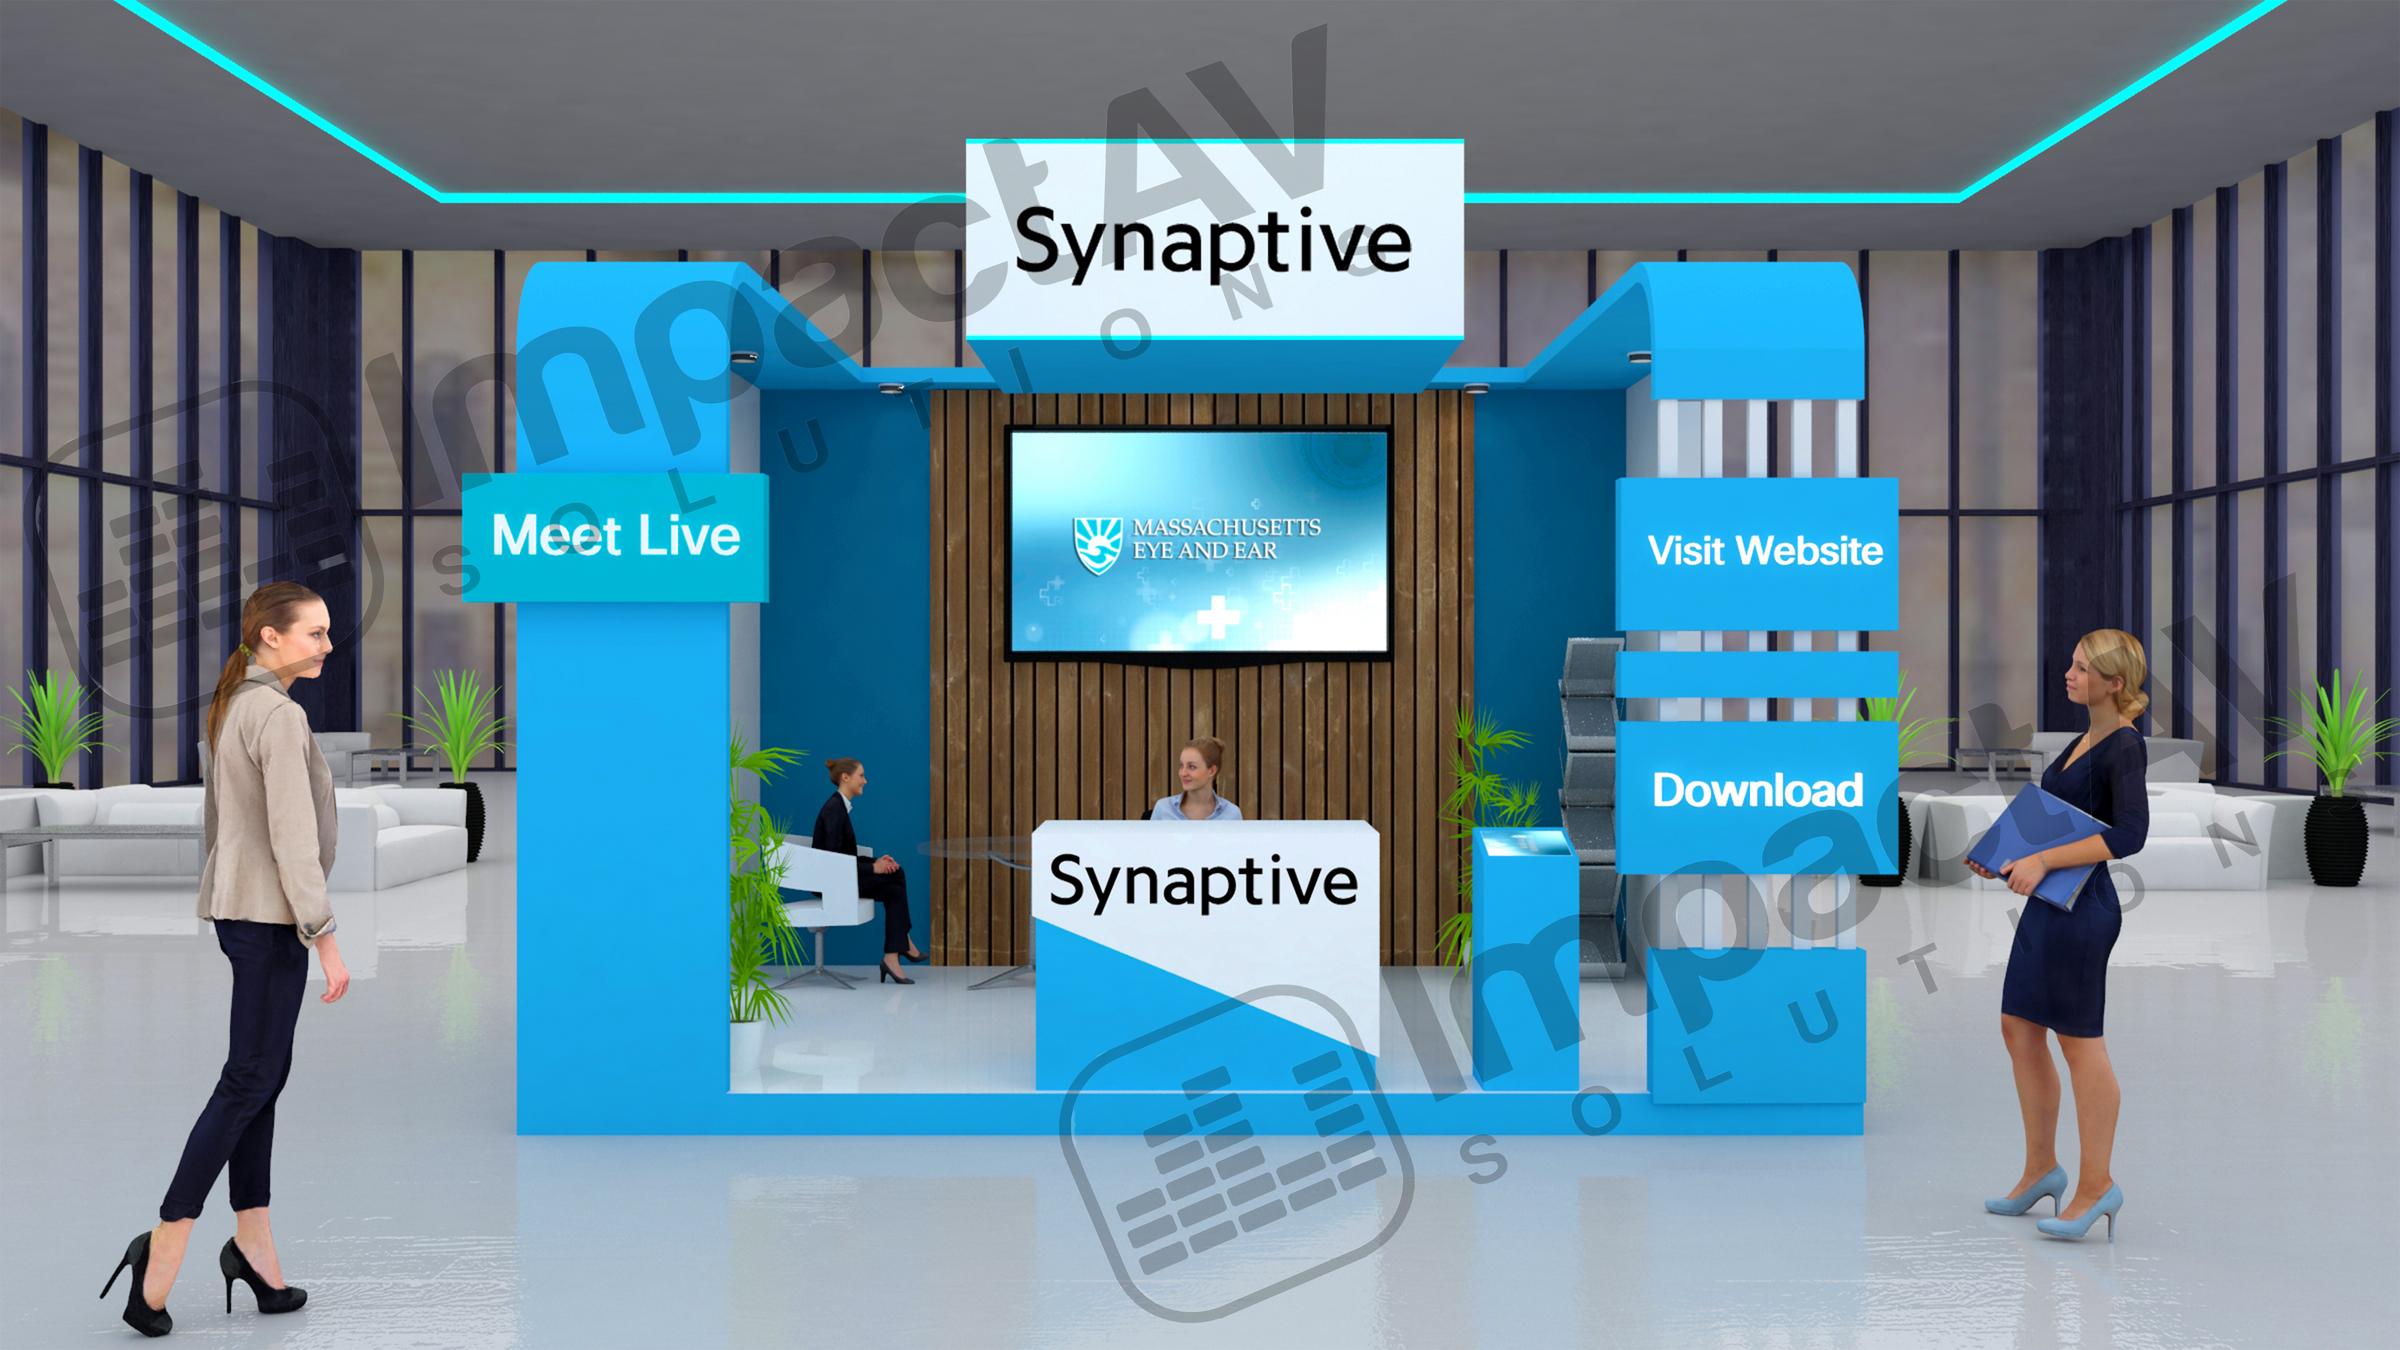 MEEI Synaptive